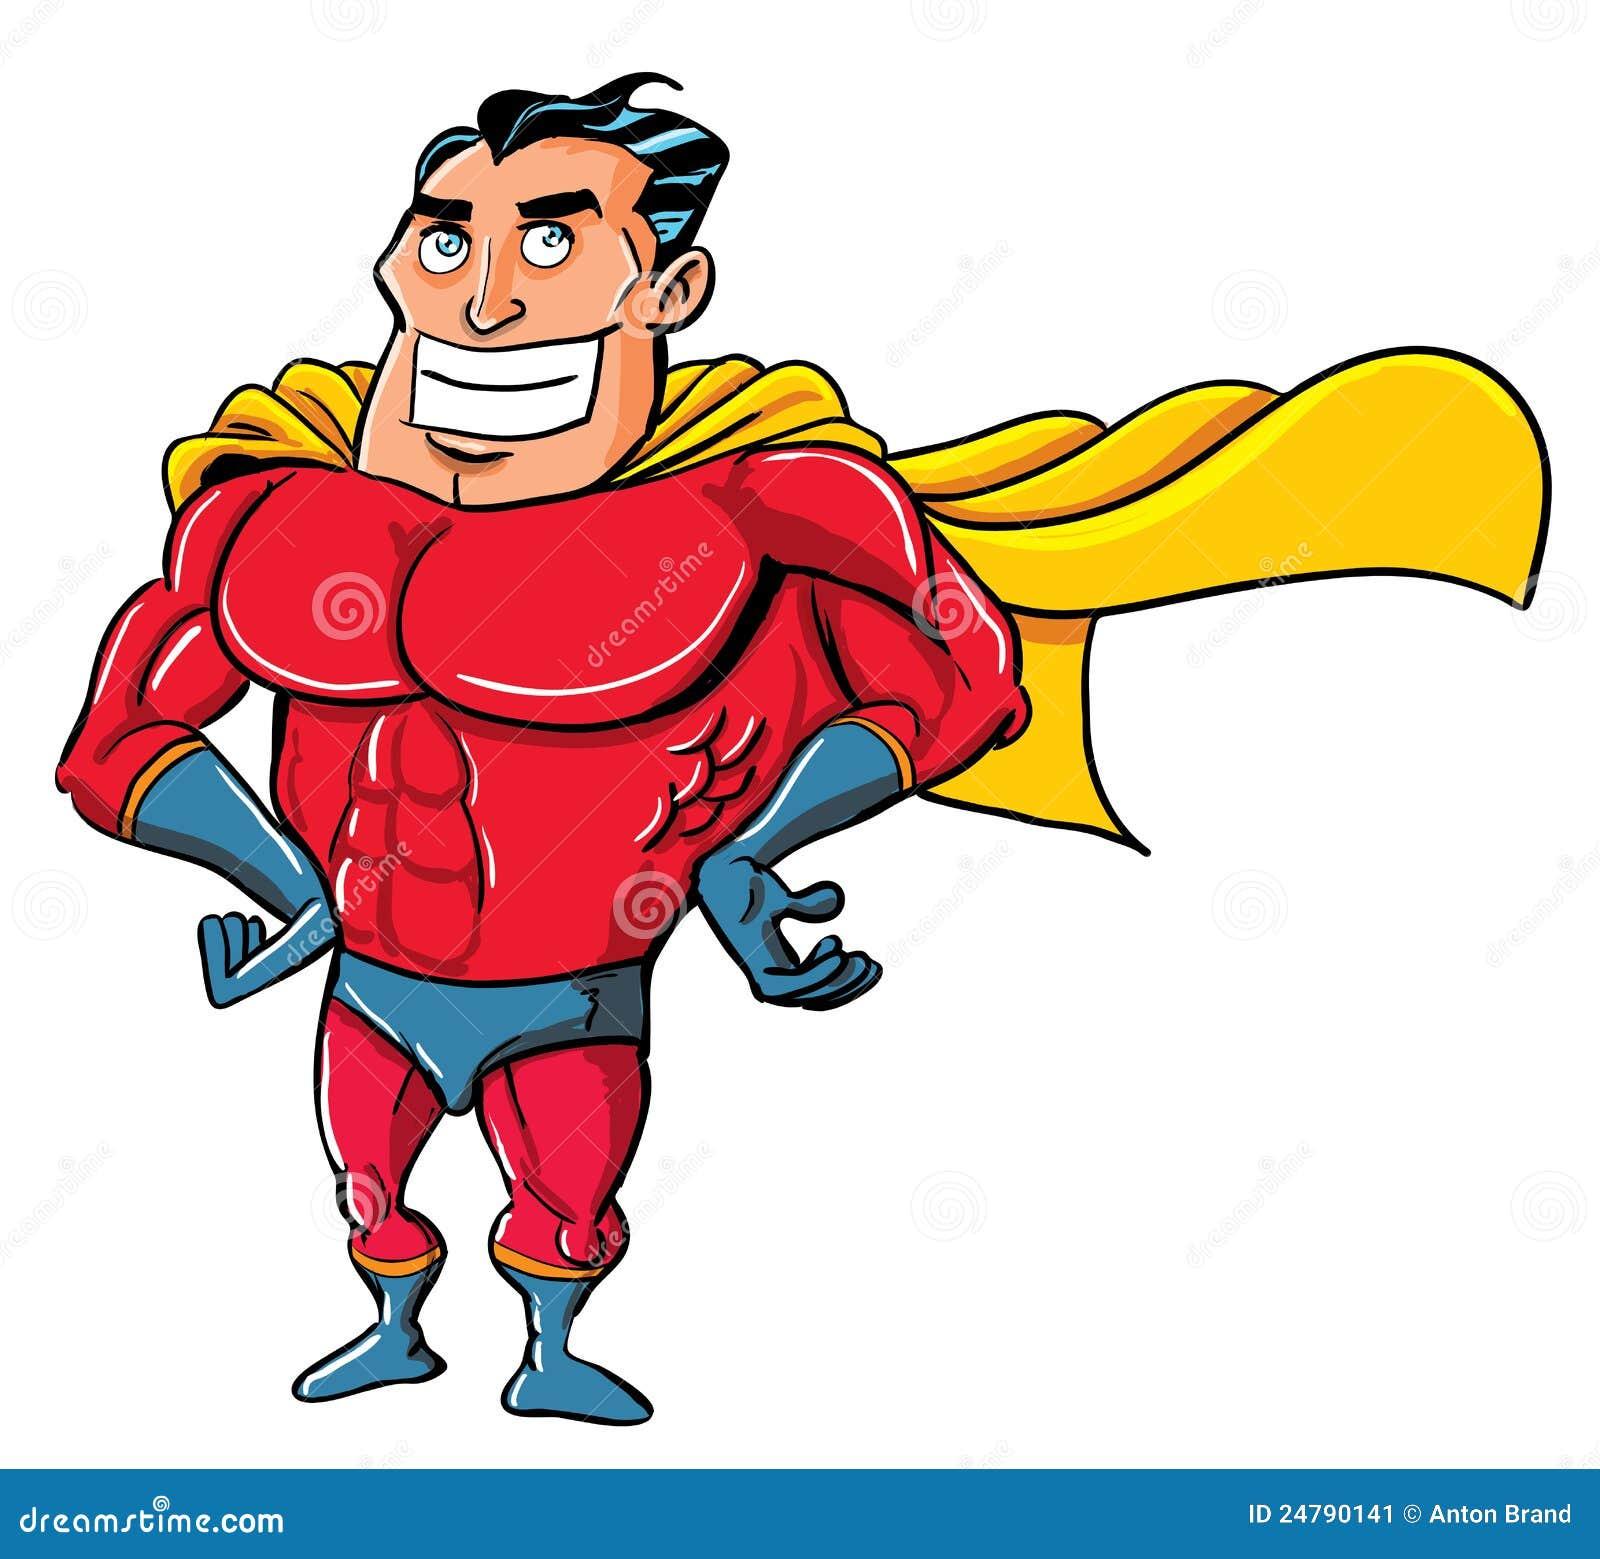 Cartoon Superhero In A Classic Pose Stock Image - Image: 24790141